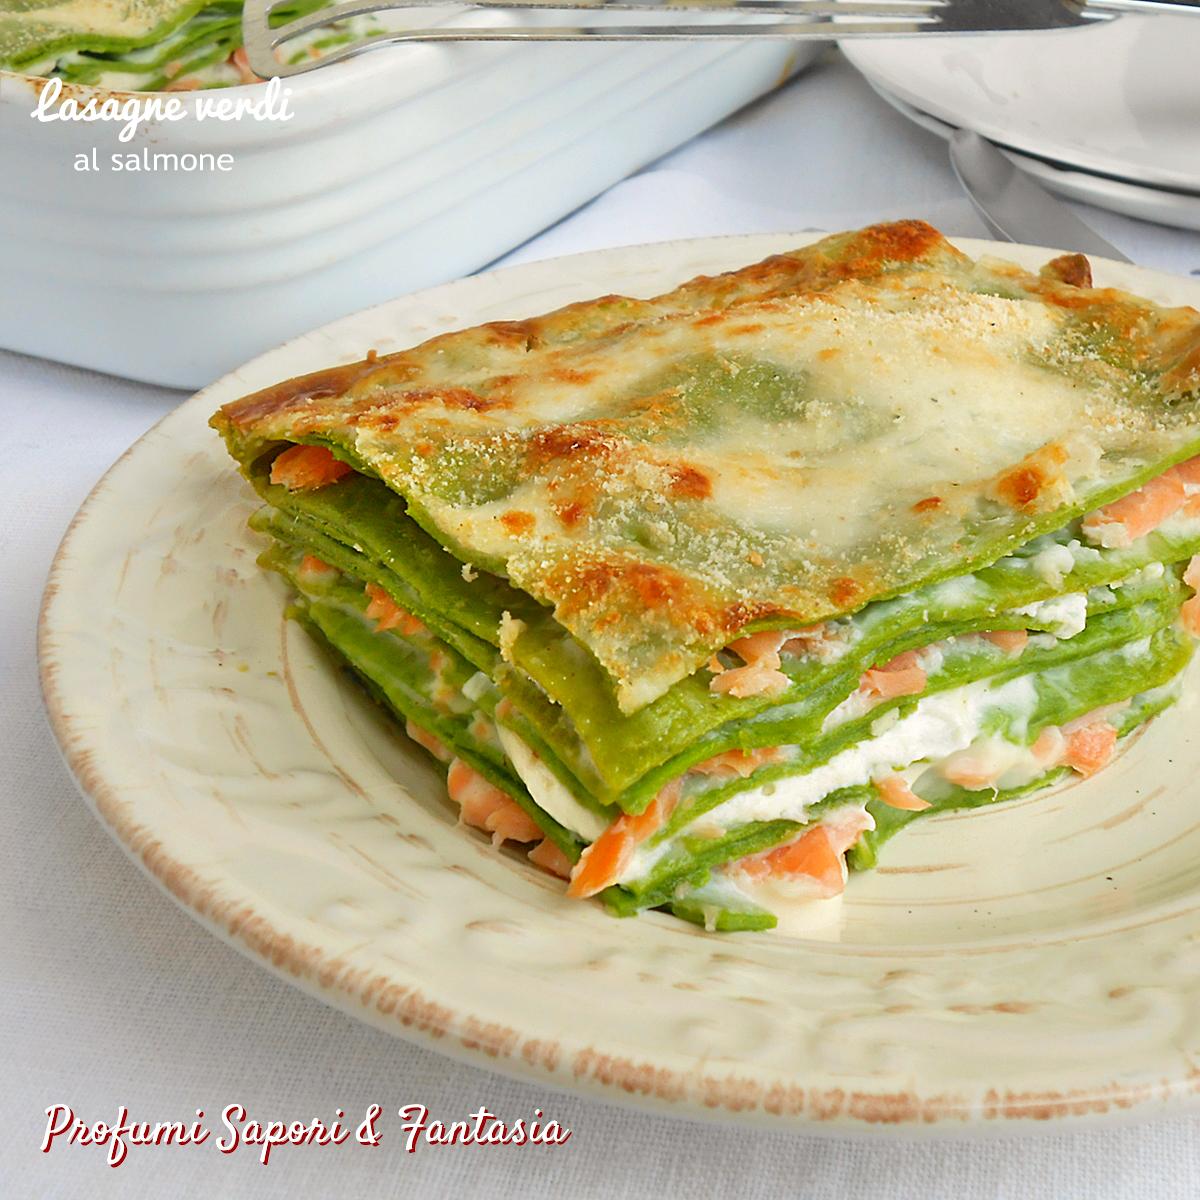 Lasagne-verdi-al-salmone